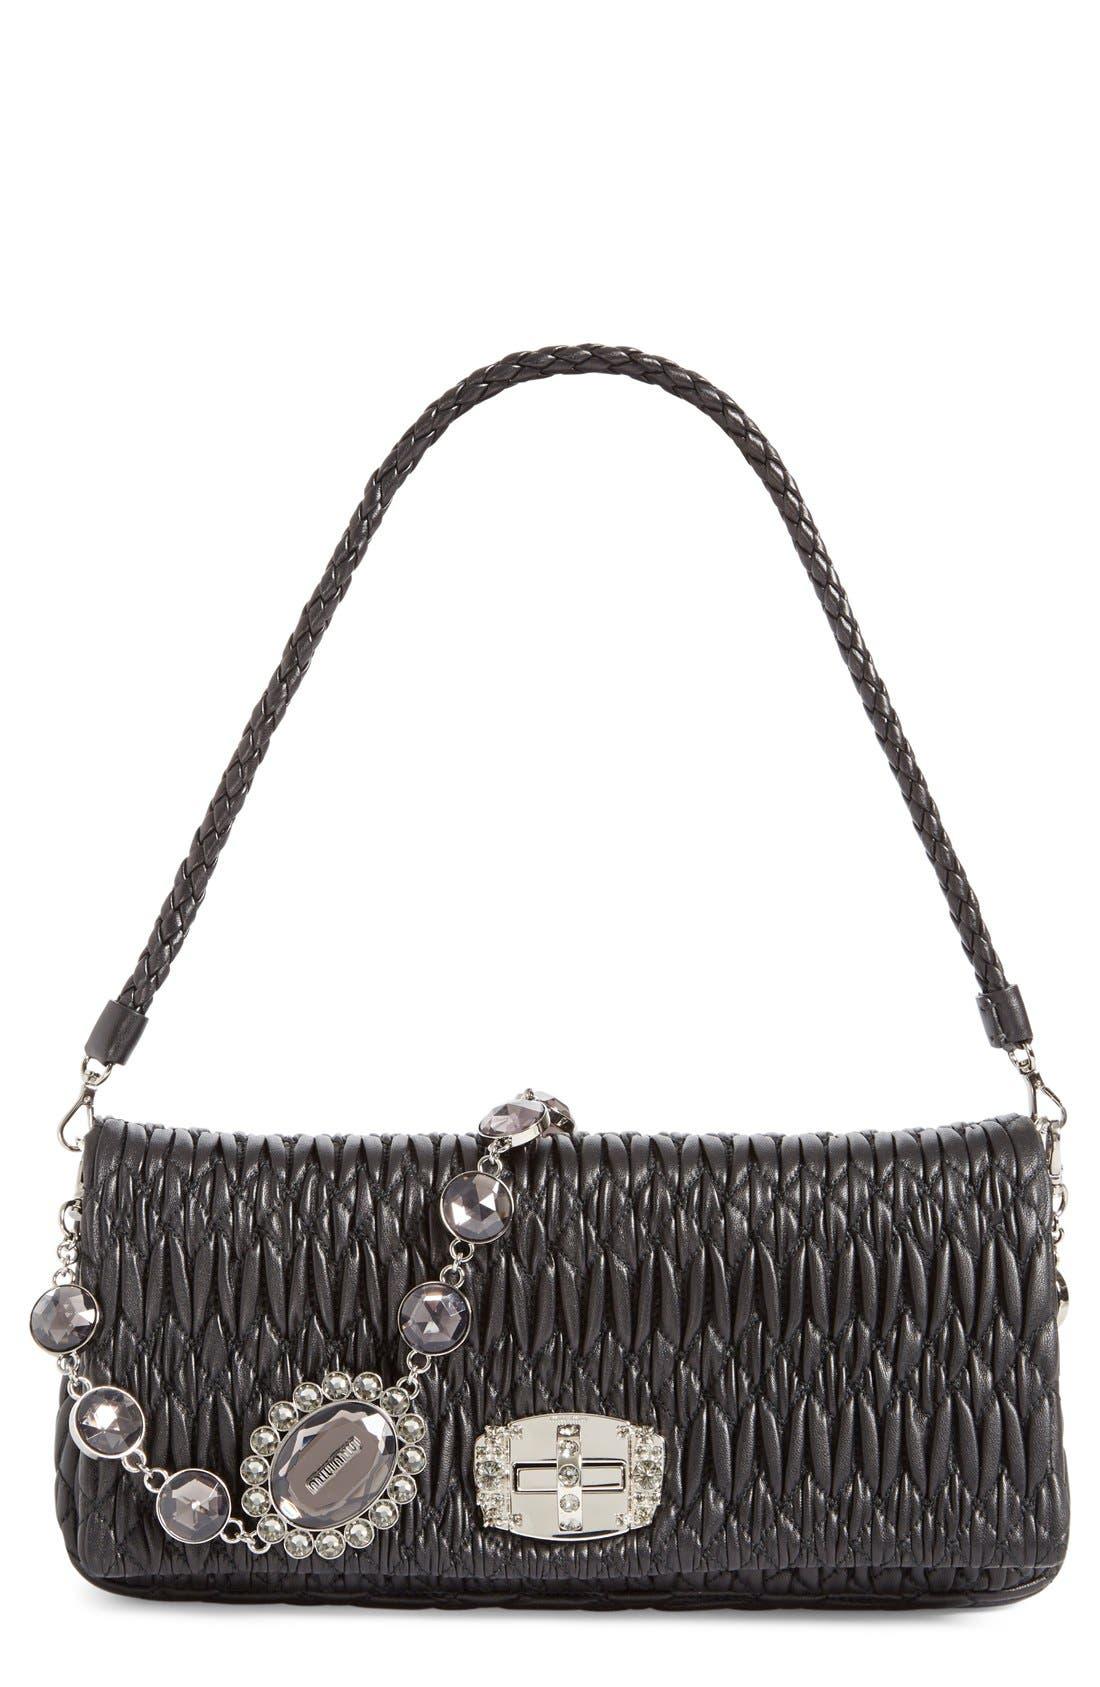 MIU MIU Medium Swarovski Crystal Chain Leather Shoulder Bag